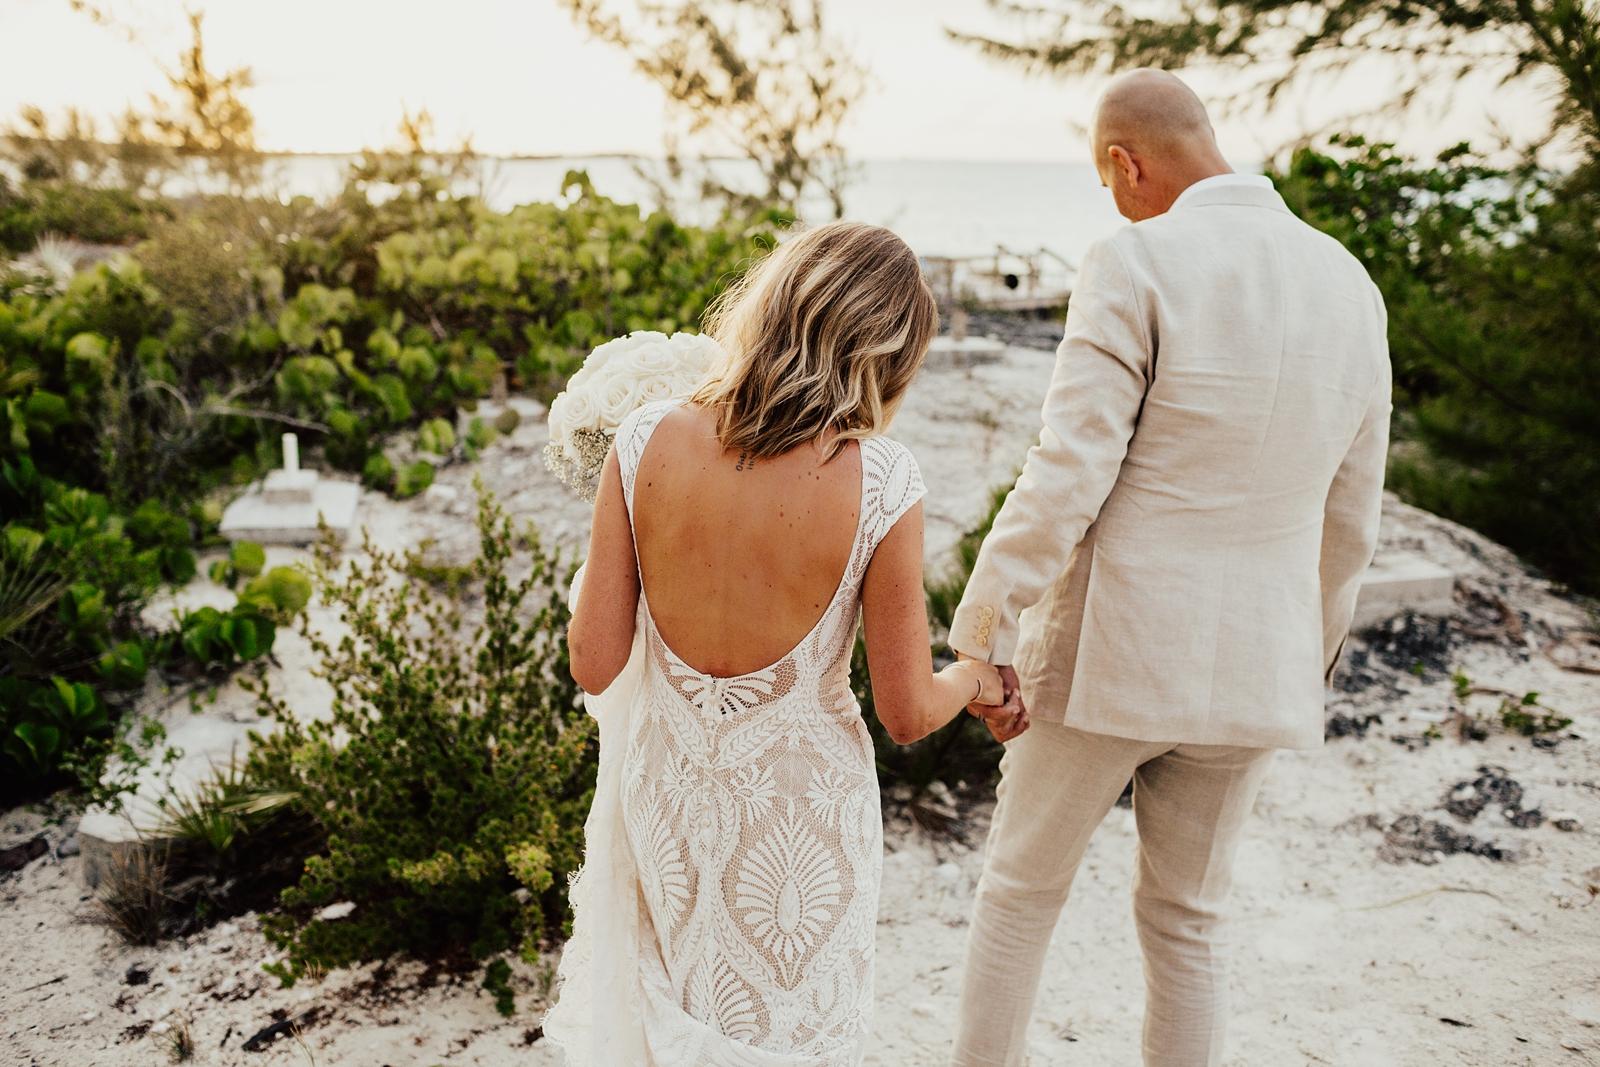 Jenni & Andrew Intimate Beach Destination Wedding in Little Exuma, Bahamas_0522.jpg